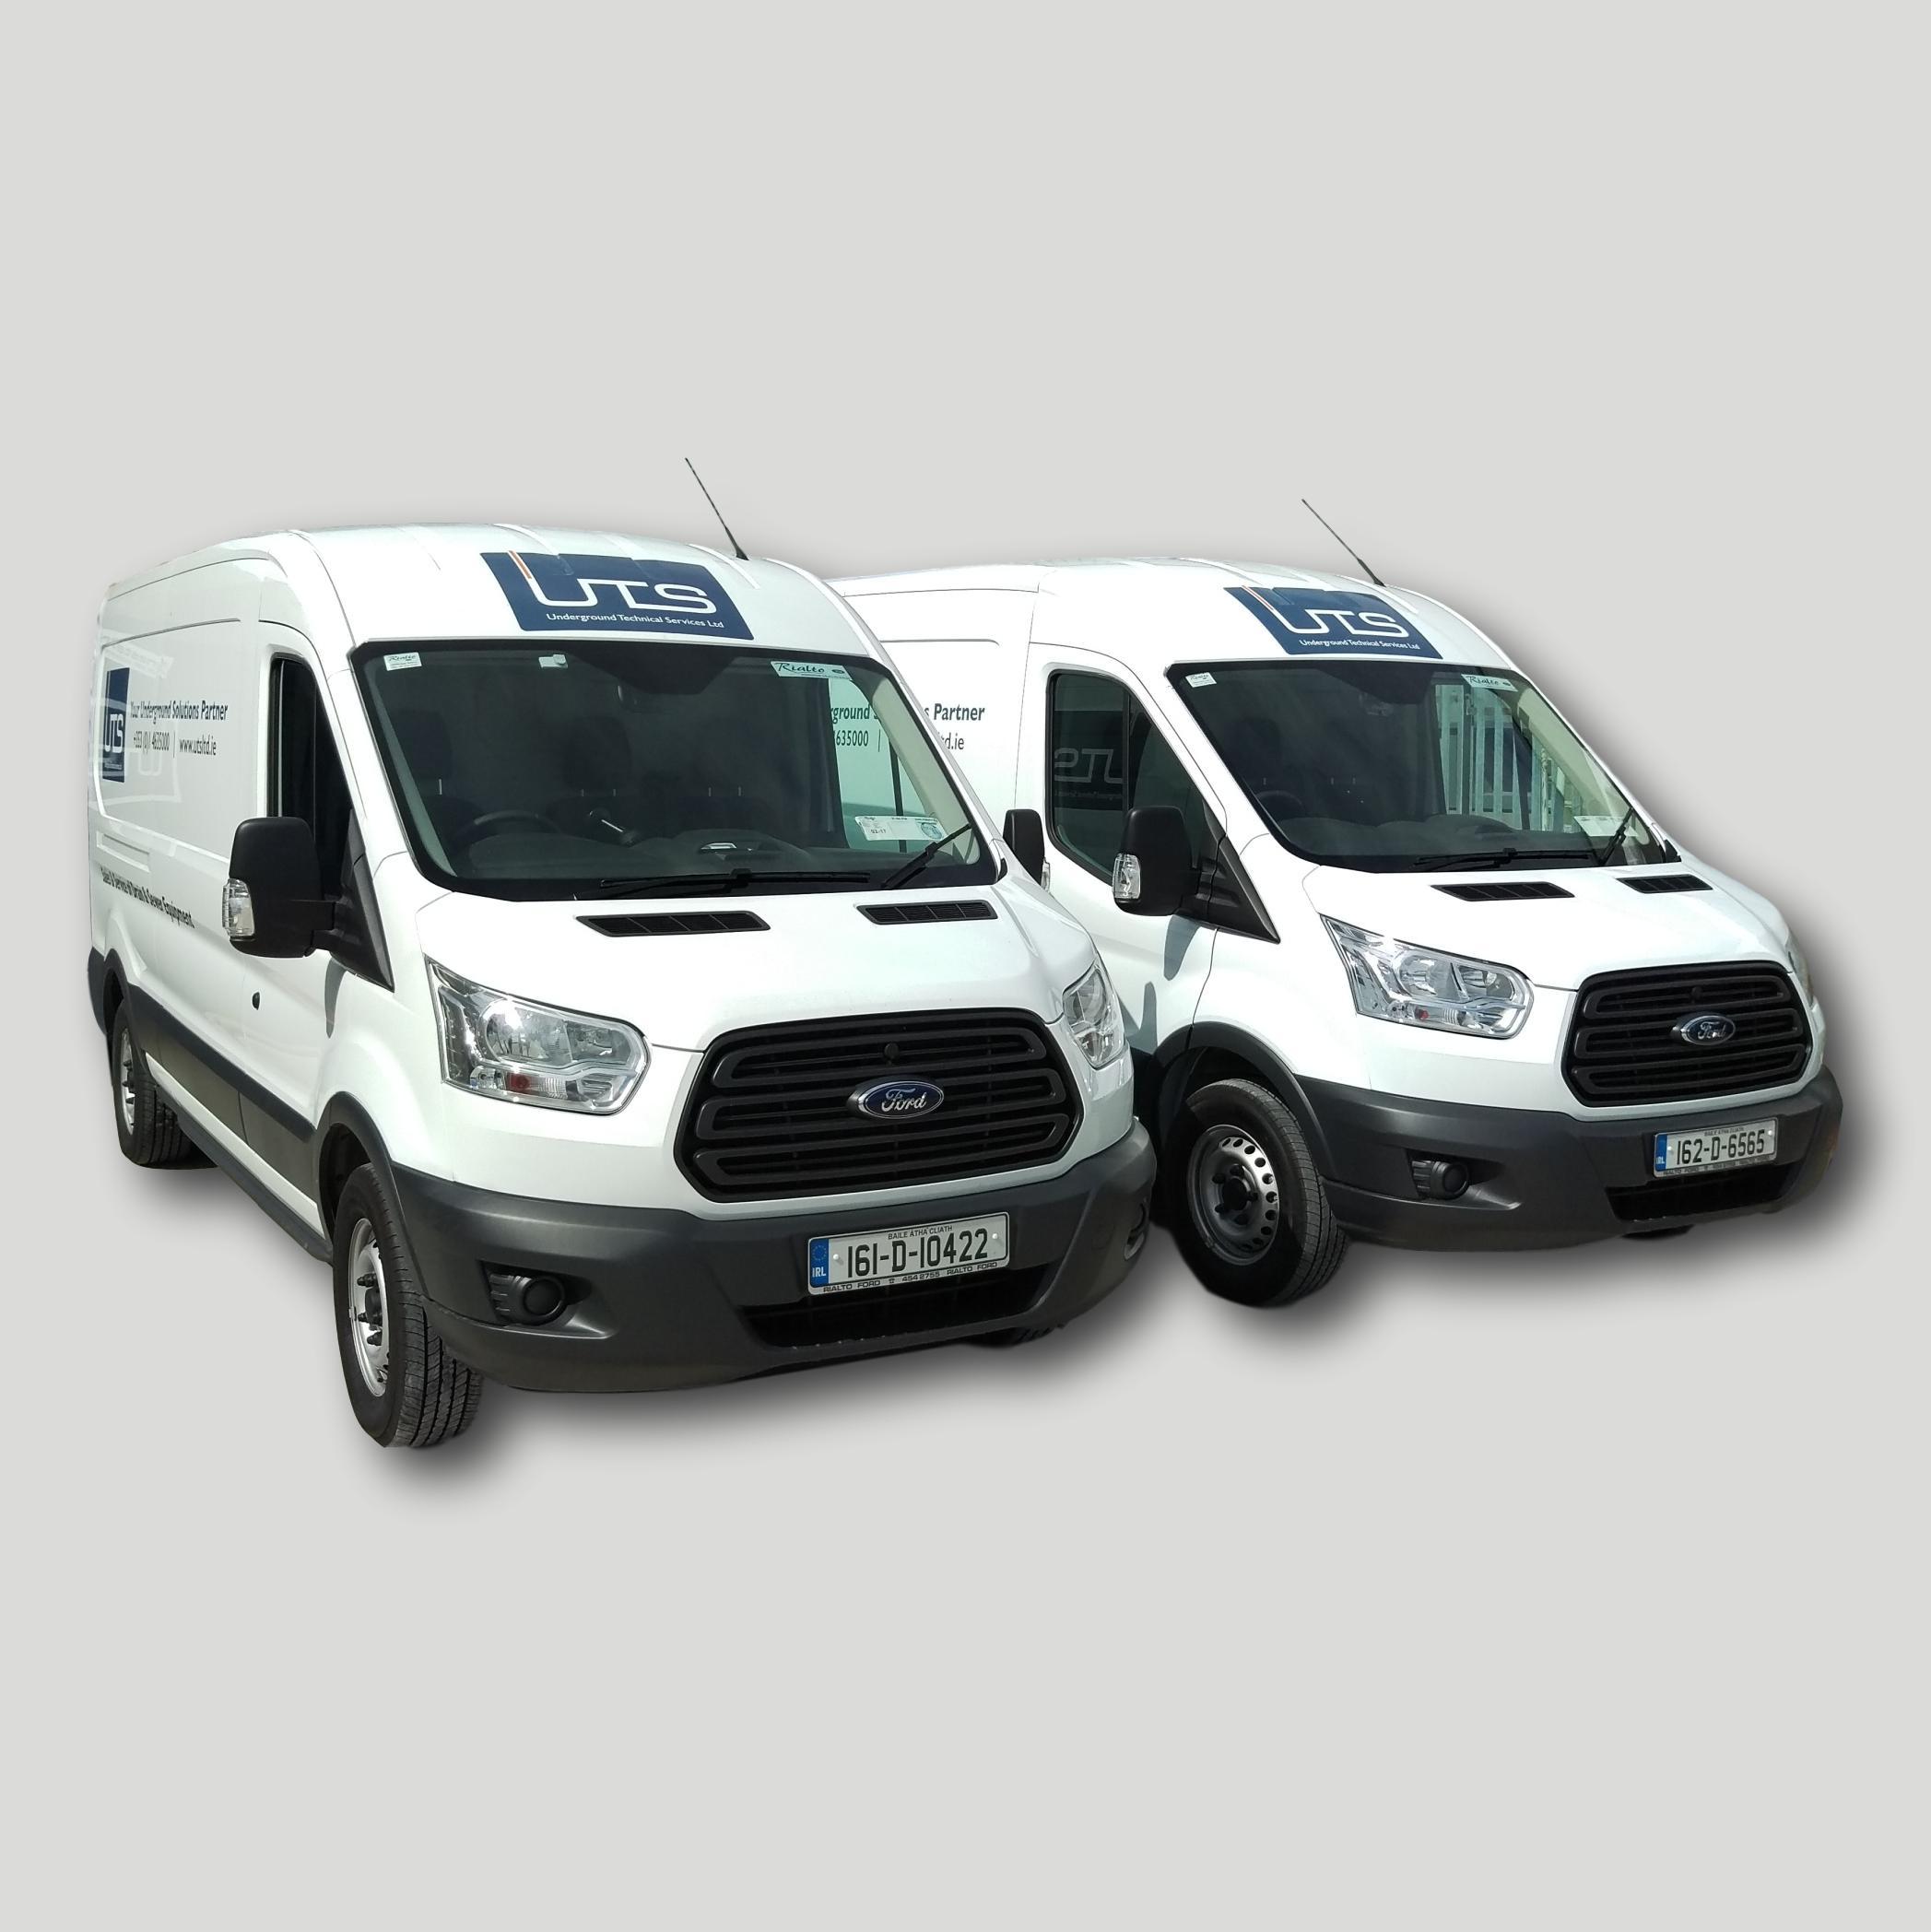 uts-mobile-service-vans-grey